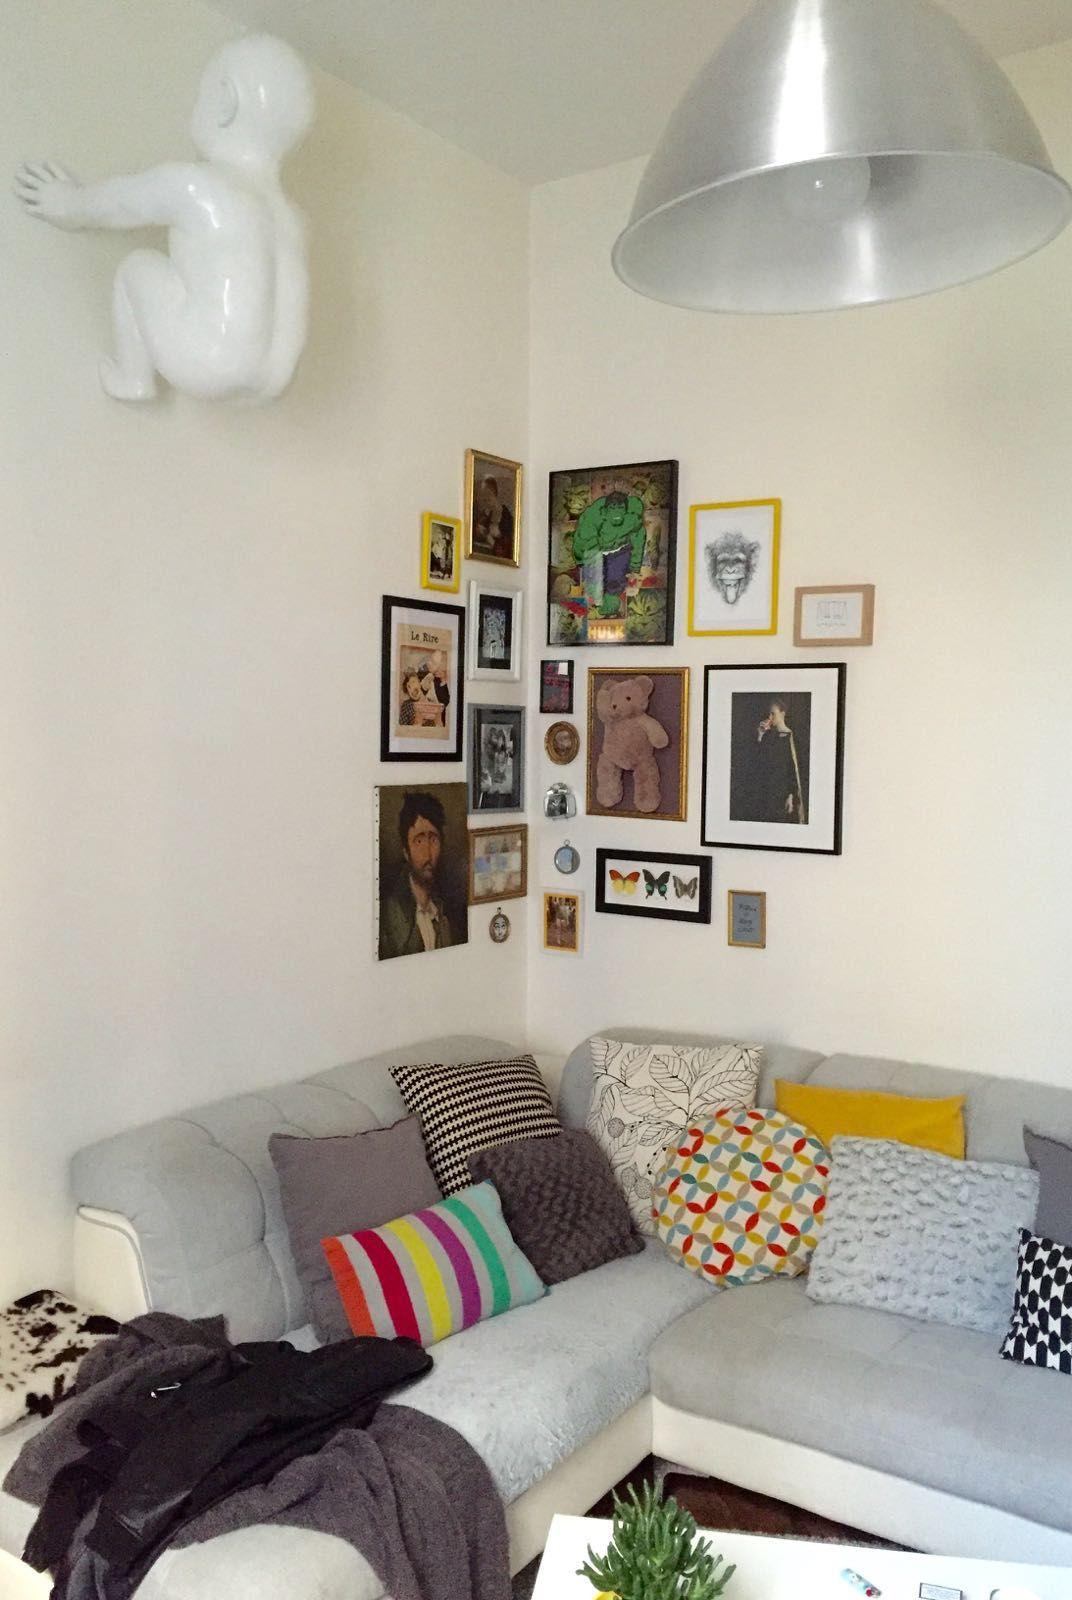 Pin by athina giova on Living room | Wall decor bedroom ... on Creative Living Room Wall Decor Ideas  id=98112